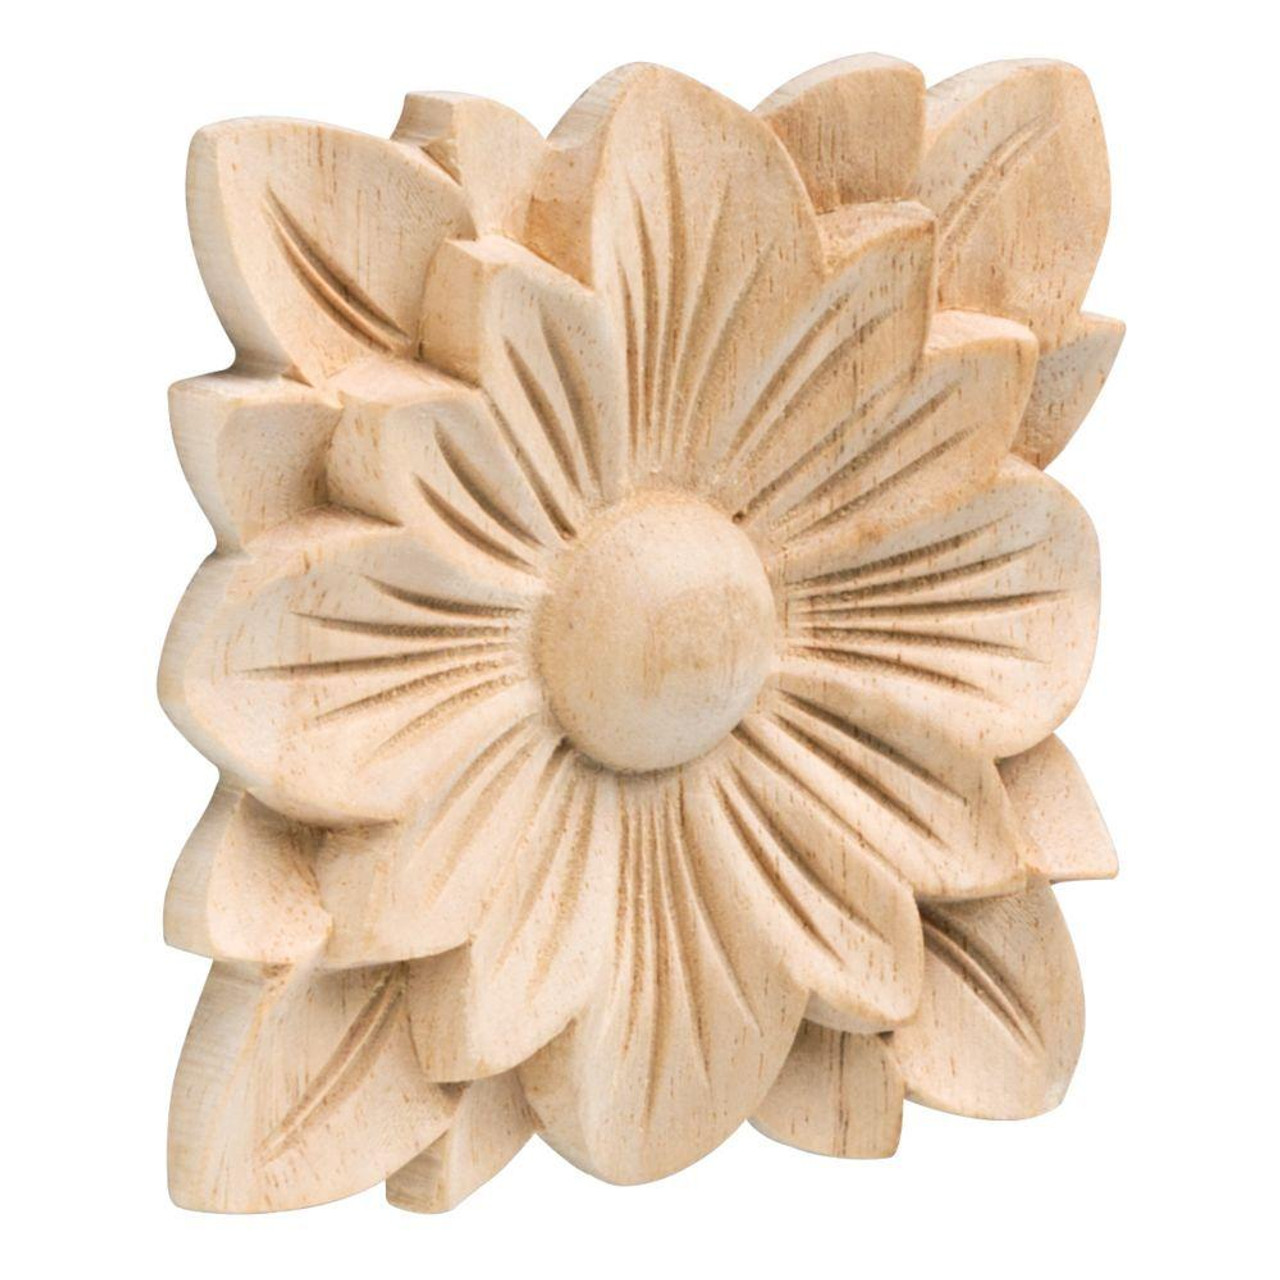 "Liberty 3 1/2"" Vintage Style Unfinished Wood Flower Furniture Embellishment"